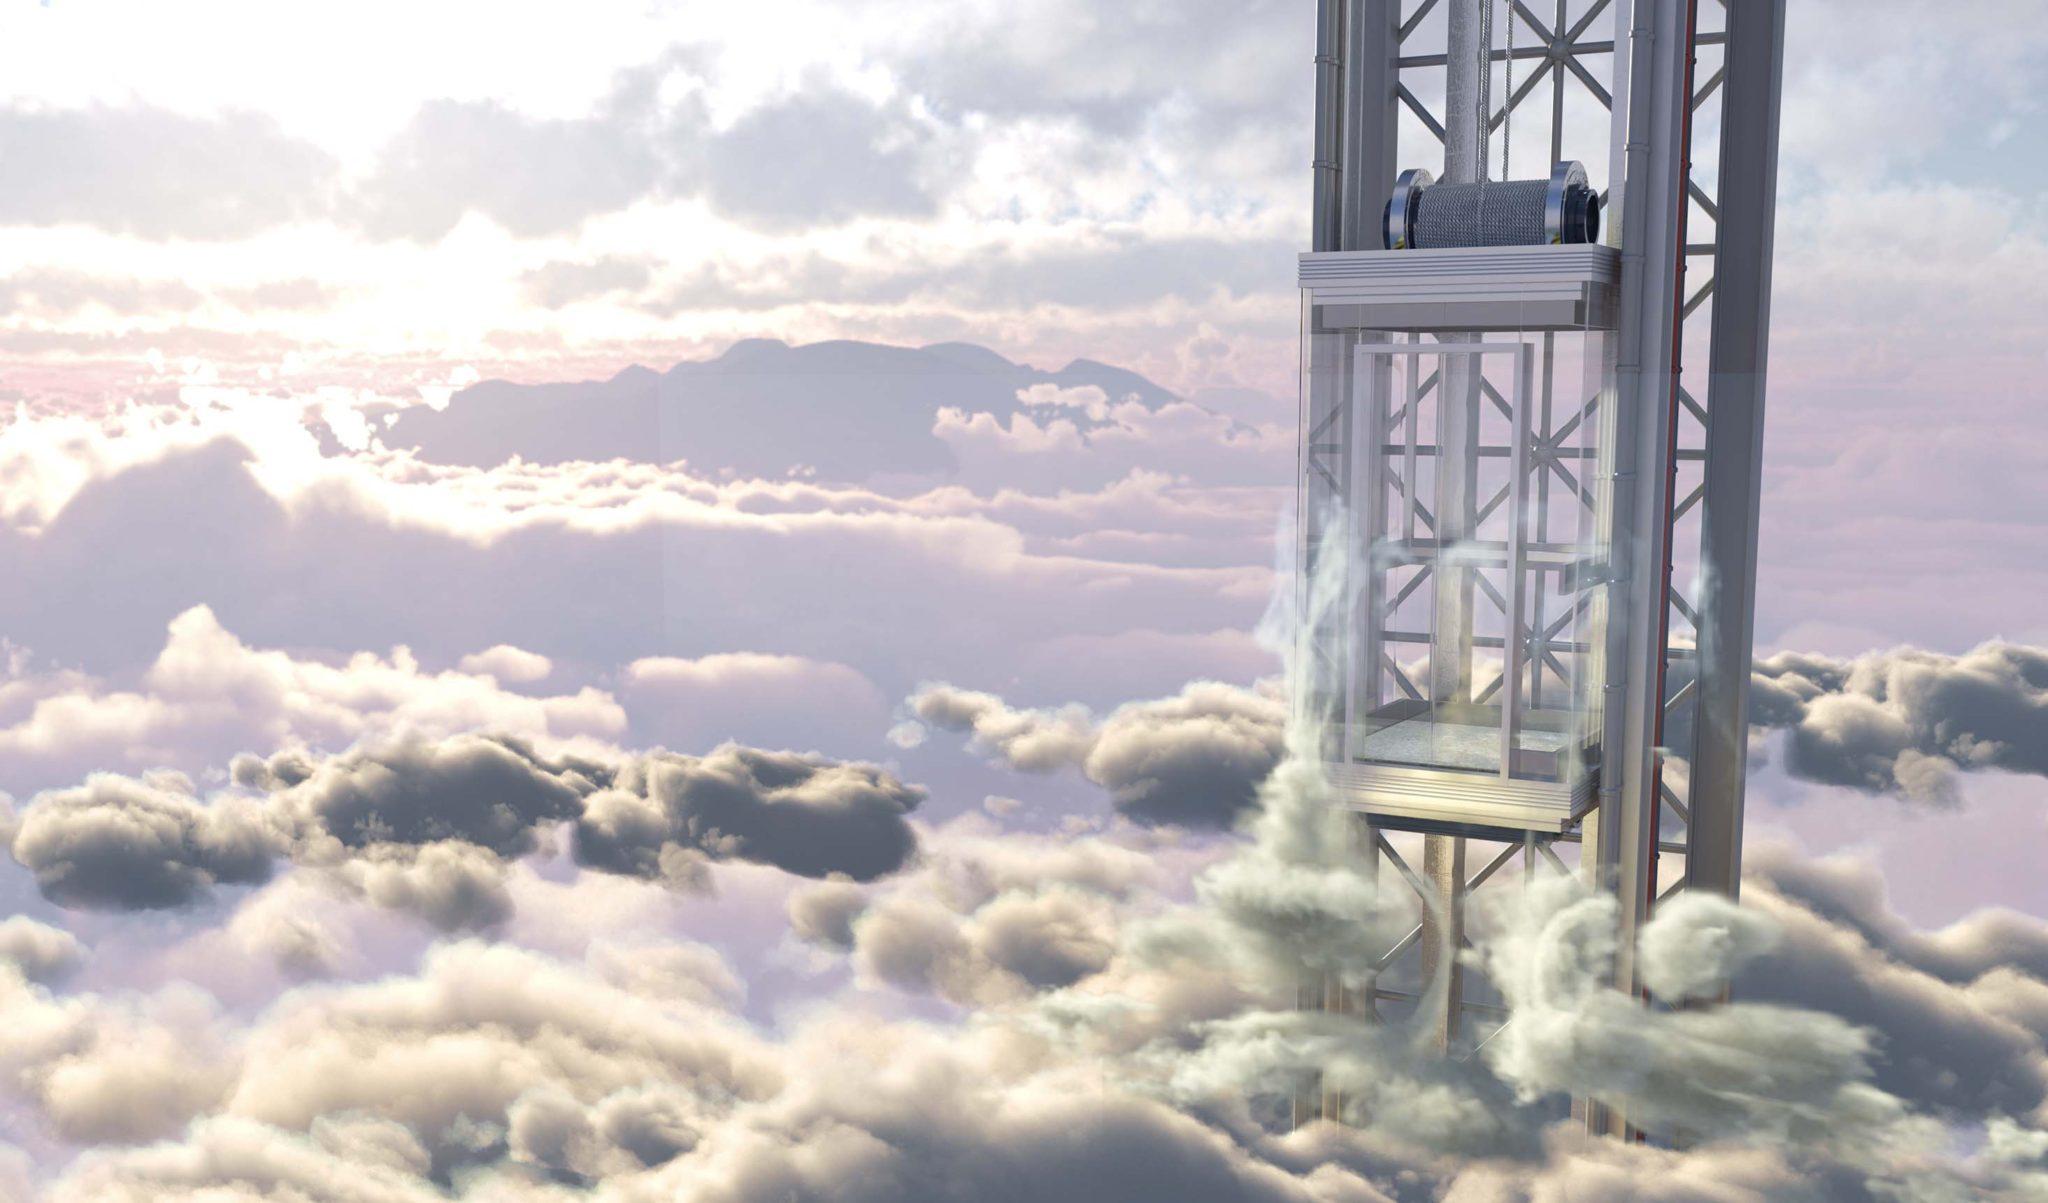 en iyi asansör firmaları ankara, asansör firmaları ankara keçiören, ankara sincan asansör firmaları, ankara asansör servisi, hidrolik asansör ankara, asansör bakım ankara yenimahalle/ankara, ankara asansör firmaları iş ilanları, asansör üreten firmalar,Ankara Asansör, ankara asansör firmaları, Asansör, asansör firması, Asansör Montaj Firması, Asansör Montajı, Asansör Montajı Nasıl Yapılır, asansörcü, niğde asansör firmaları, ray montajı, sedye asansörleri, Türkiye Asansör Firmaları, En İyi Asansör Firmaları Ankara Asansör Firmaları Ankara Keçiören Ankara Sincan Asansör Firmaları Ankara Asansör Servisi Hidrolik Asansör Ankara Asansör Bakım Ankara Yenimahalle/Ankara Ankara Asansör Firmaları Ankara Asansör Servisi Asansör Üreten Firmalar,Ankara Asansör Montajı,ankara asansör firmaları iş ilanları,asansör üreten firmalar,çankaya asansör firmaları,asansör firmaları ankara keçiören,ankara sincan asansör firmaları,asansör bakım ankara yenimahalle/ankara,ankara mamak asansör firmaları,ırak asansör firmaları,En İyi Ankara Asansör Bakım Servisi